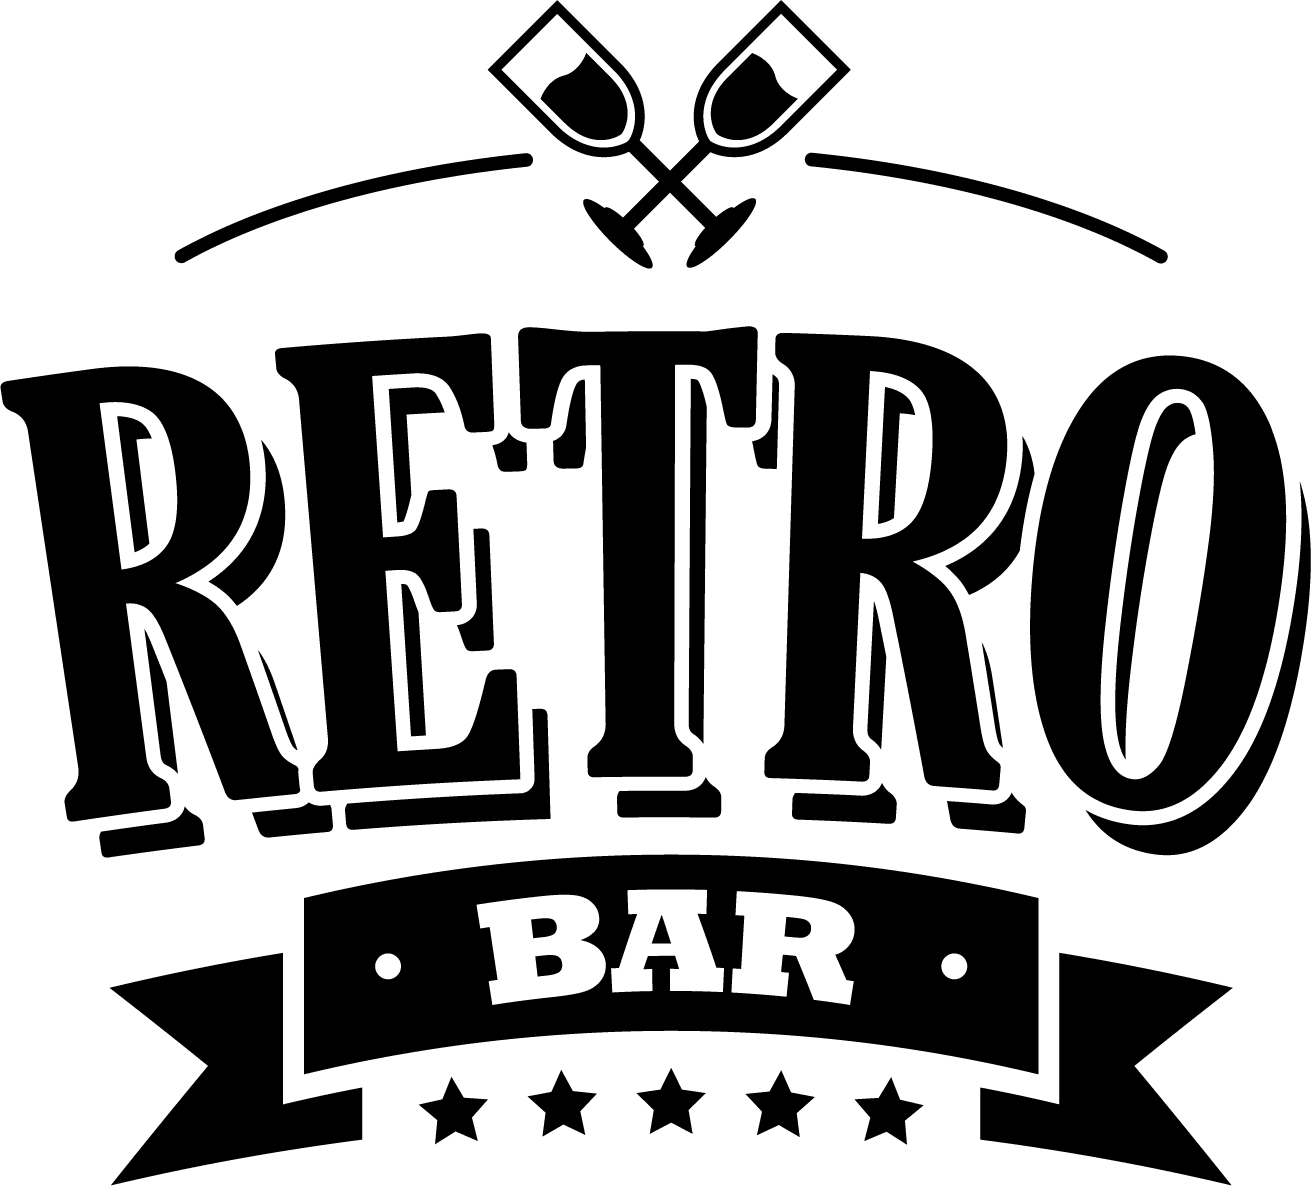 RetroBar